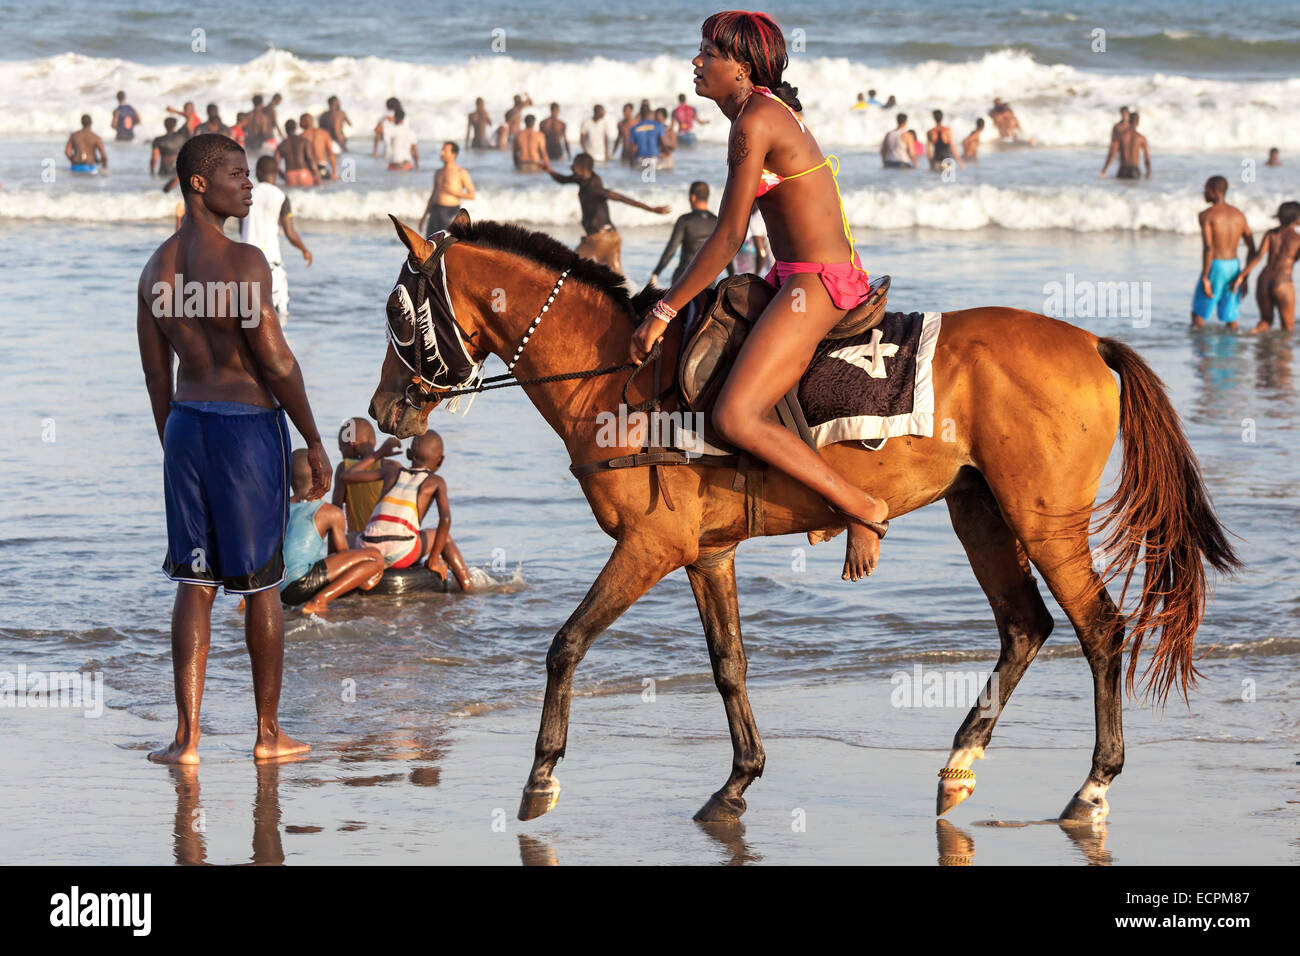 Africa Beach Horse Riding Stock Photos Afrika Et Tour Le Morne Horseback On Labadi Accra Ghana Image